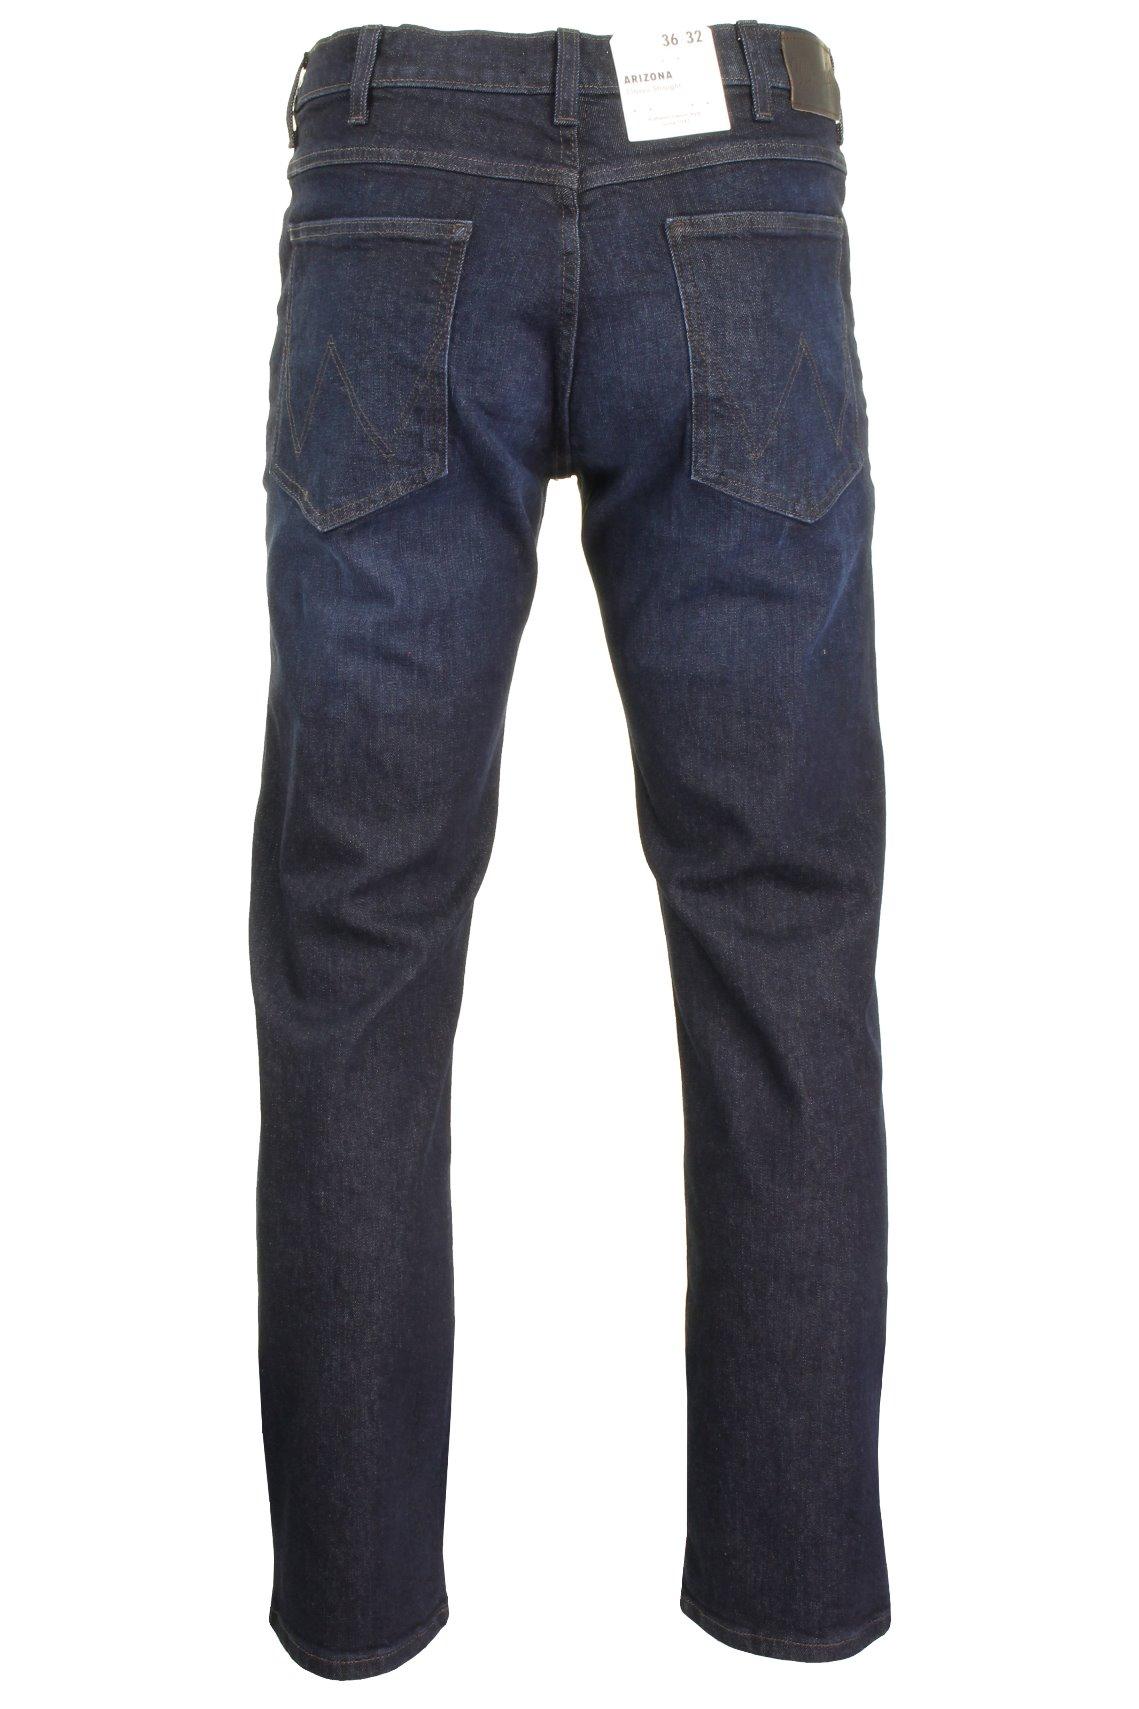 Da-Uomo-Wrangler-039-Arizona-039-jeans-Stretch-Denim-Classic-Fit-Dritto miniatura 9